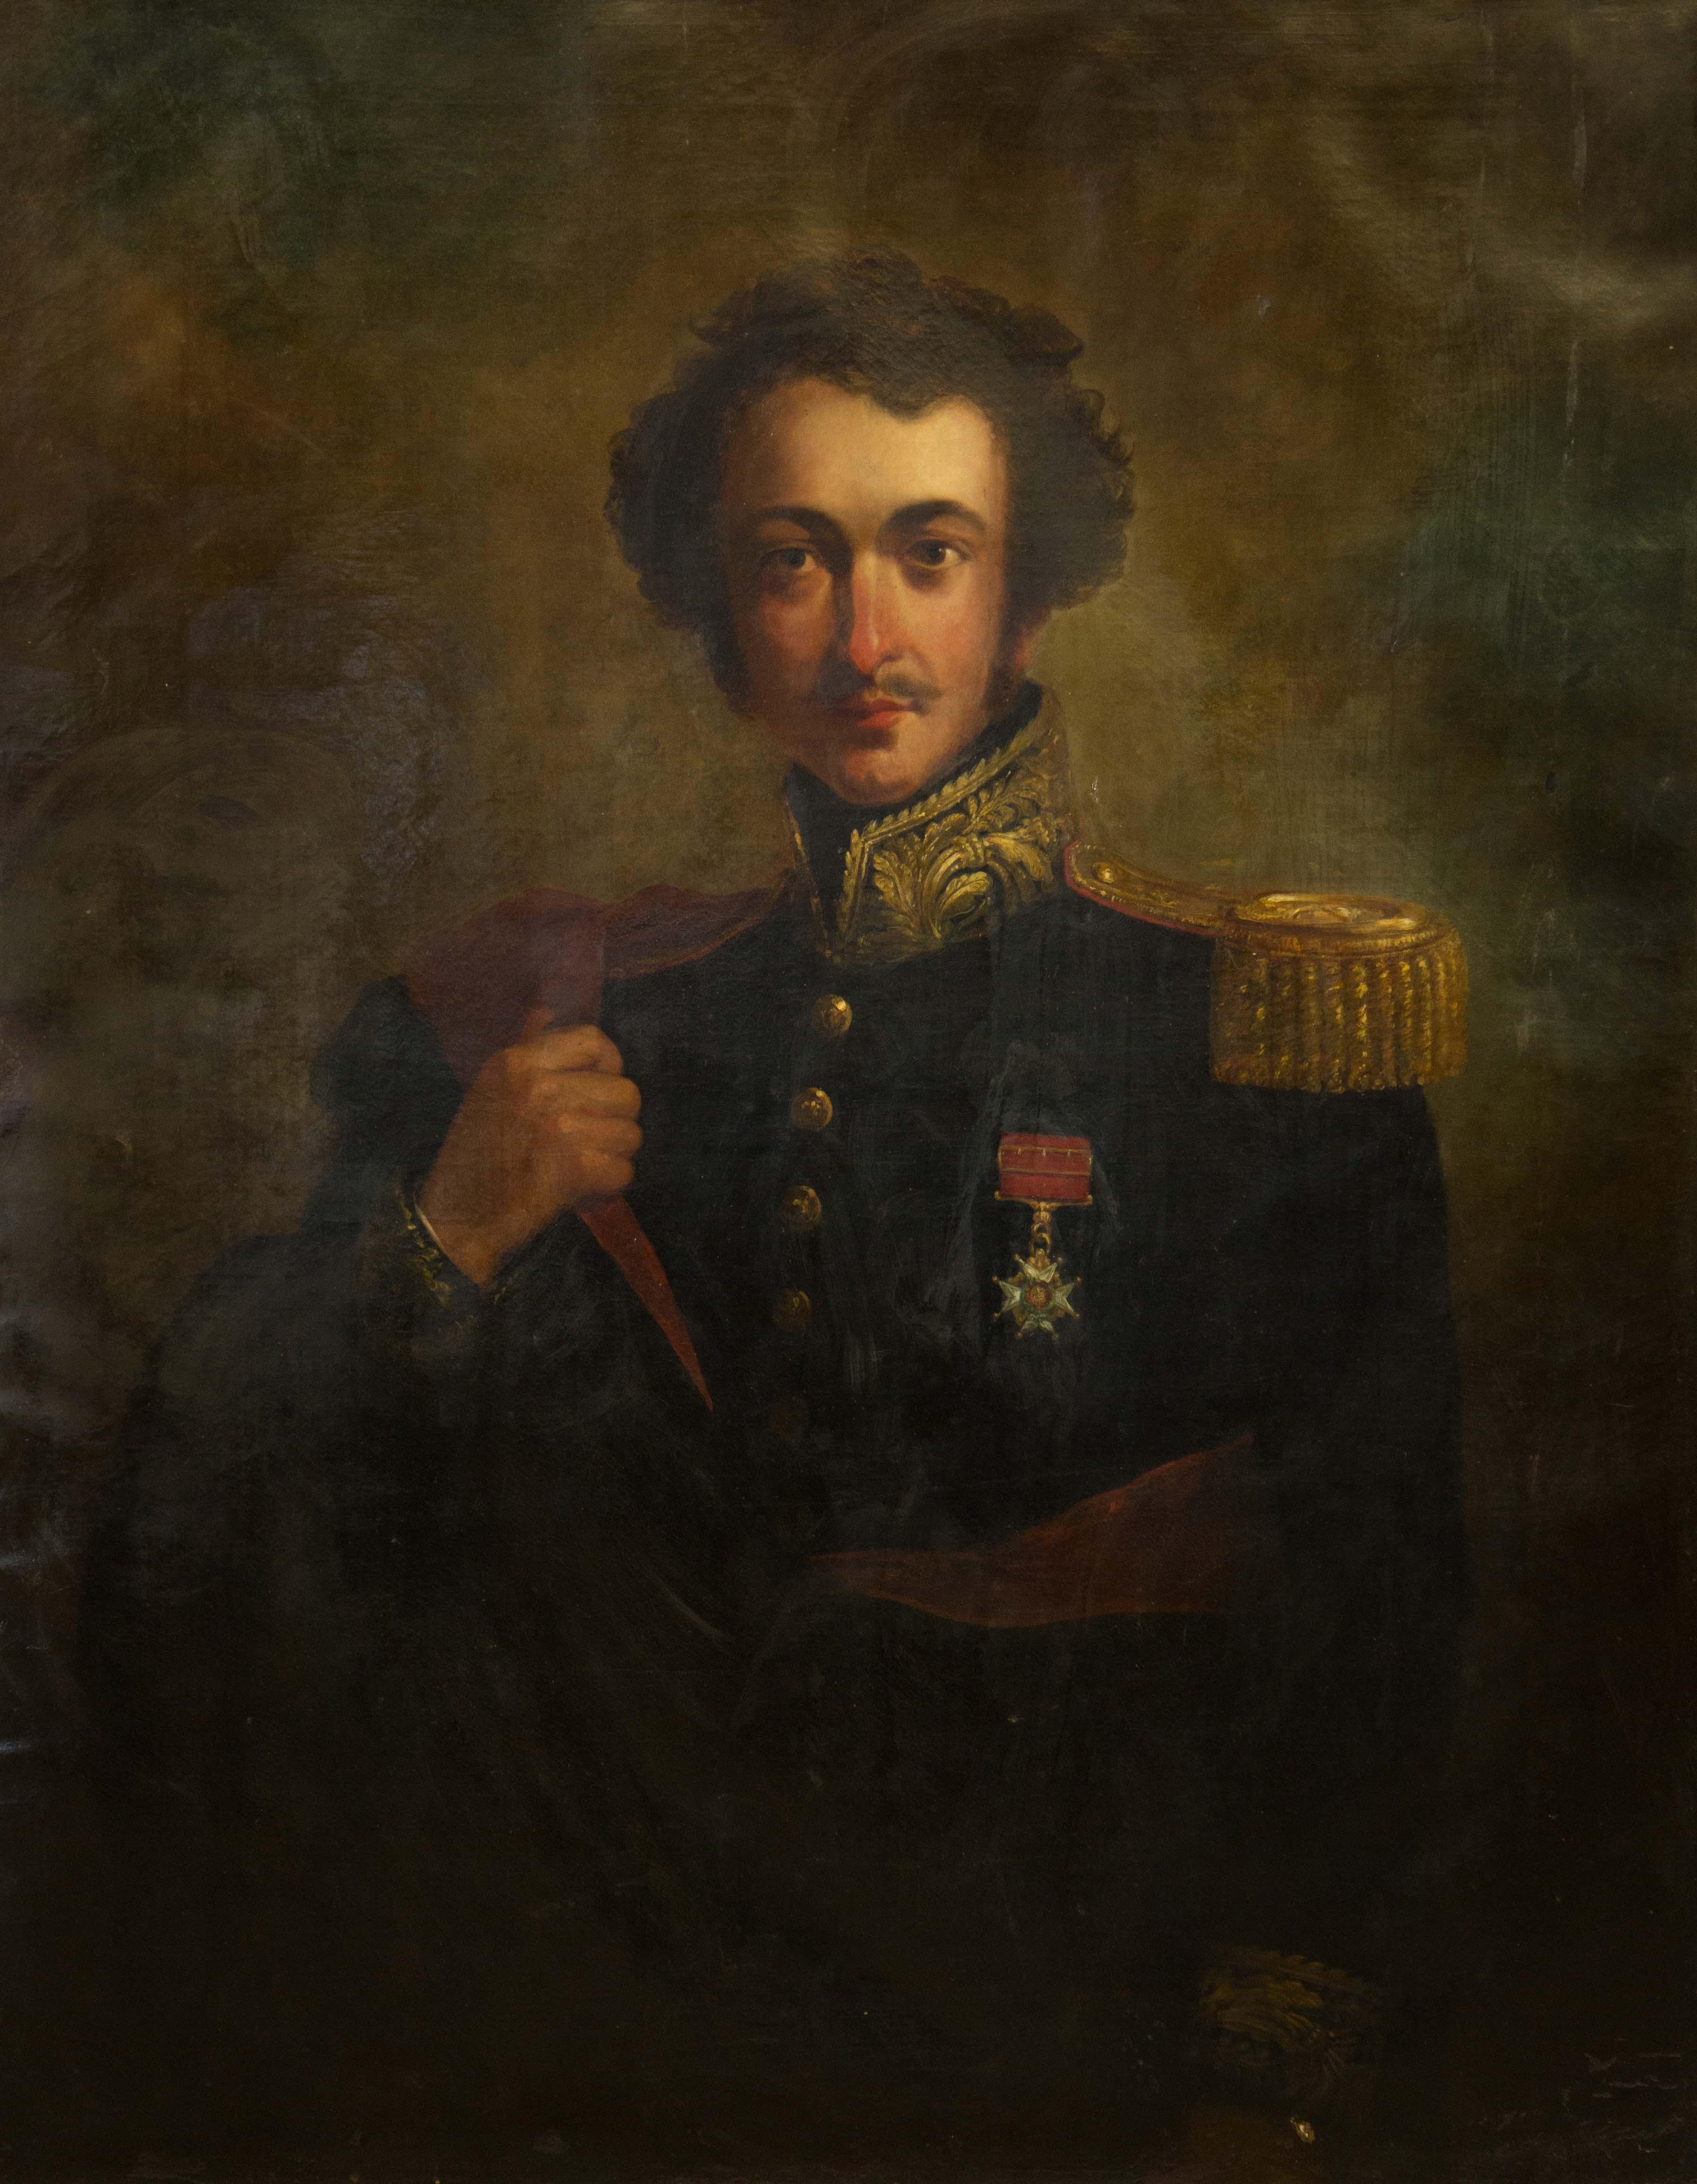 portrait of Alexander Burnes